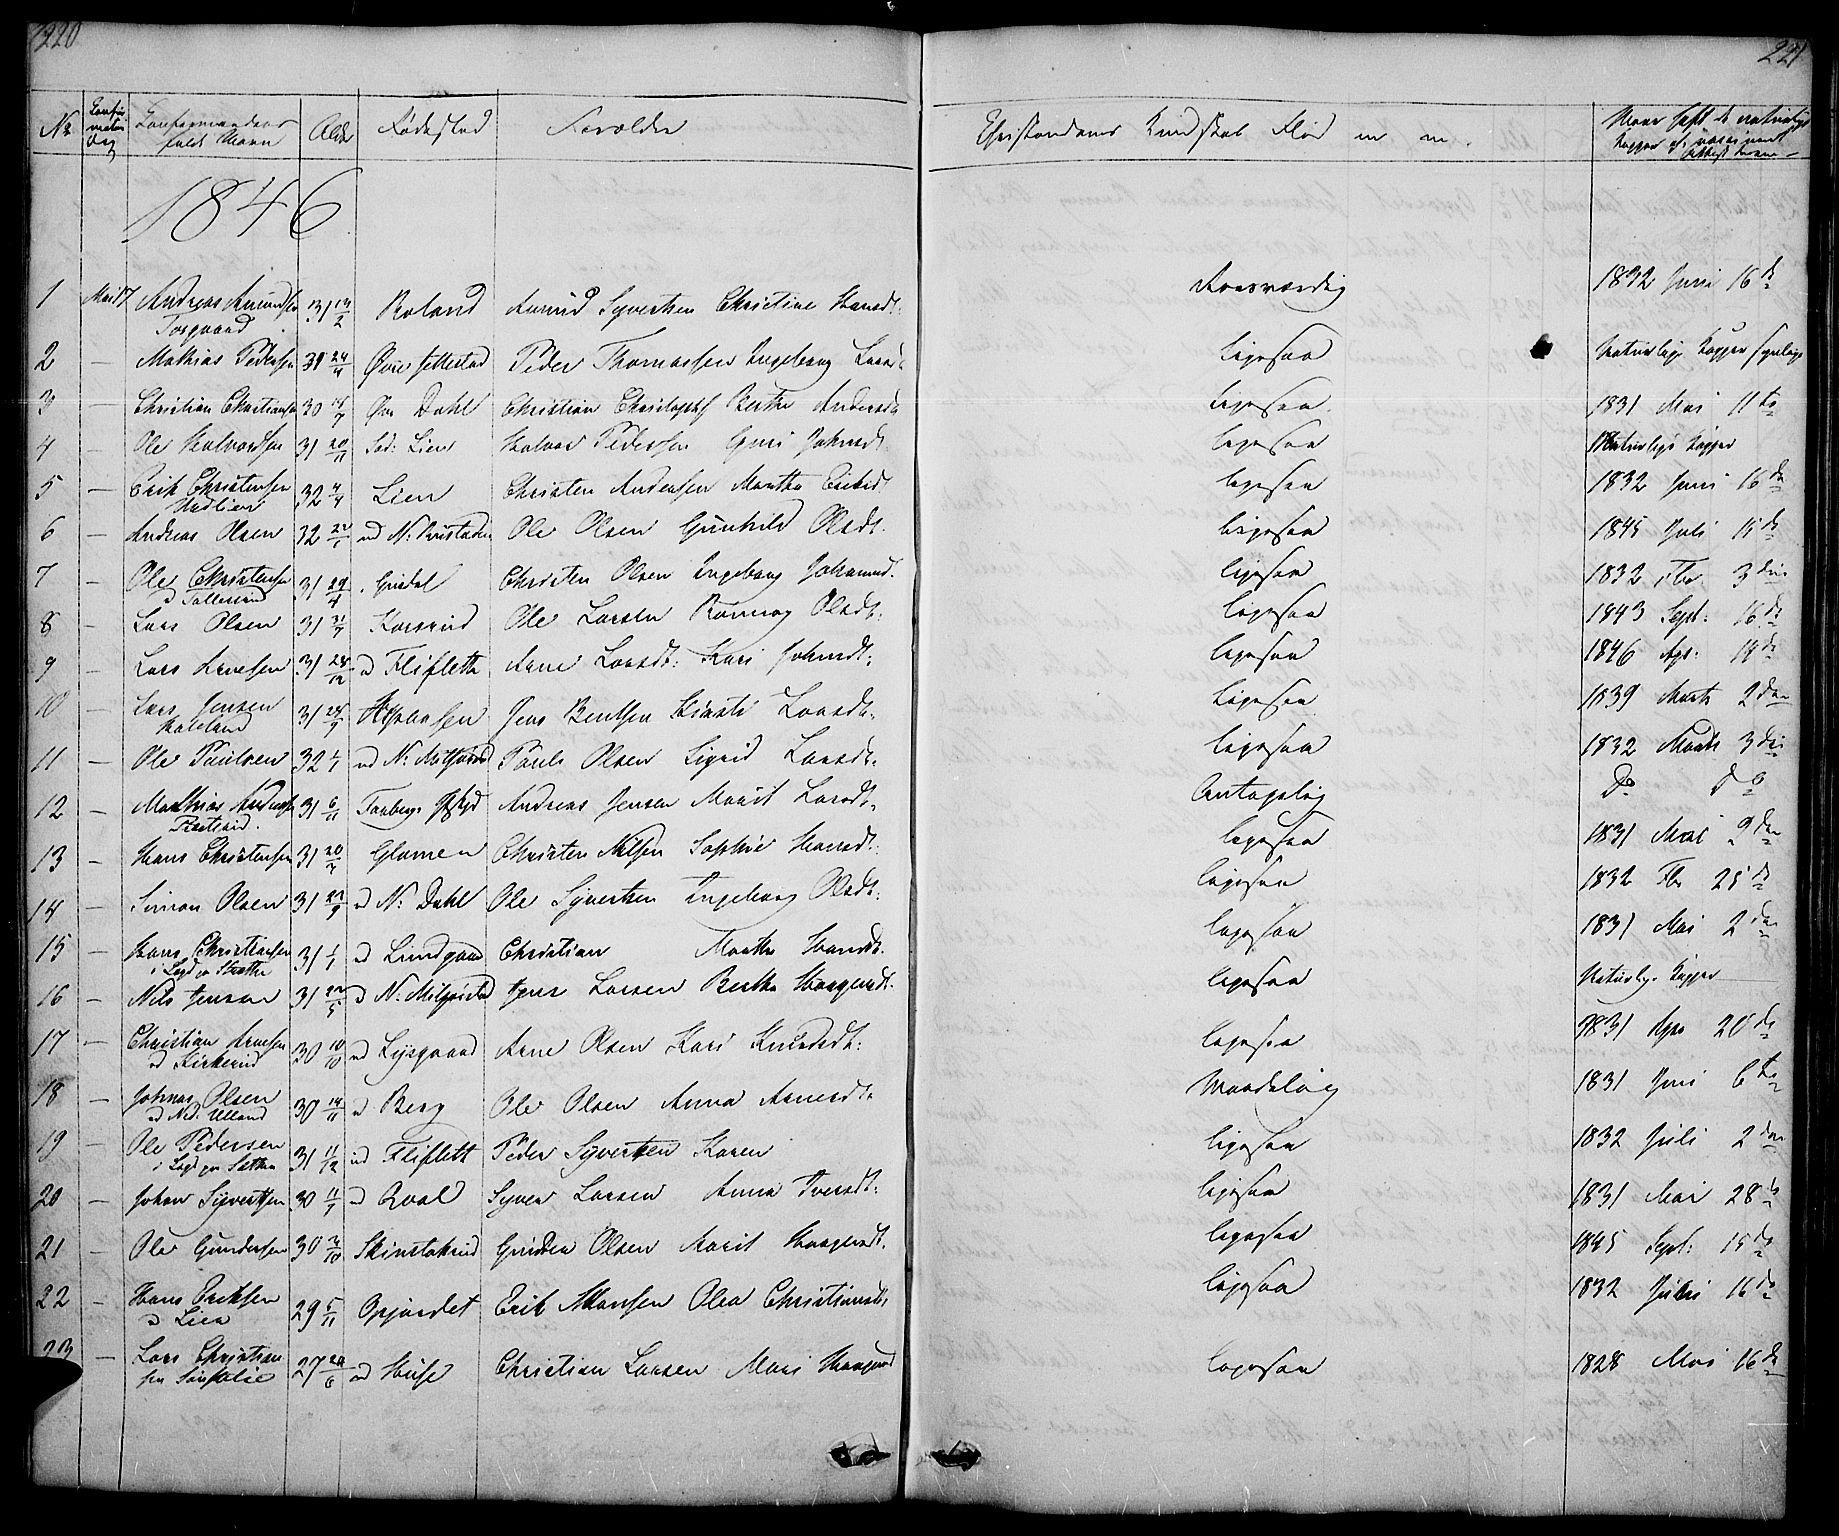 SAH, Fåberg prestekontor, Klokkerbok nr. 5, 1837-1864, s. 220-221